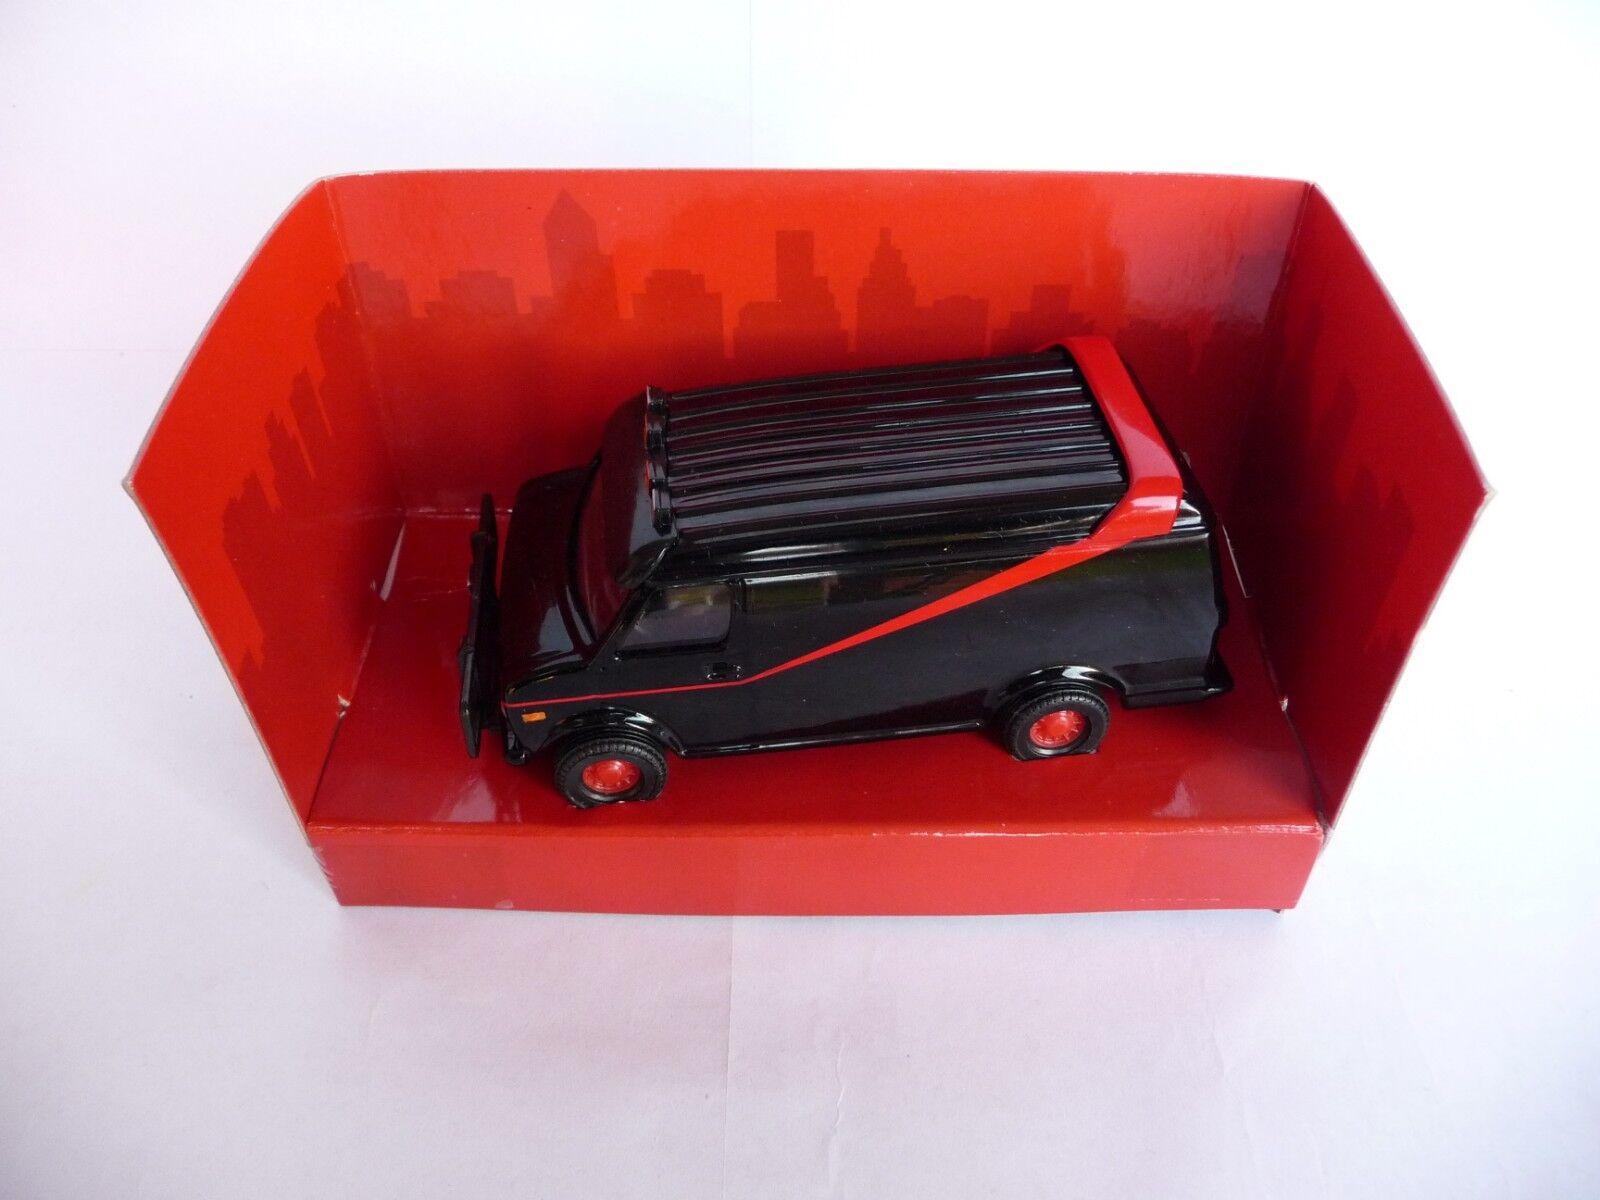 Corgi 1 36 Gmc Van A-Team CC87502